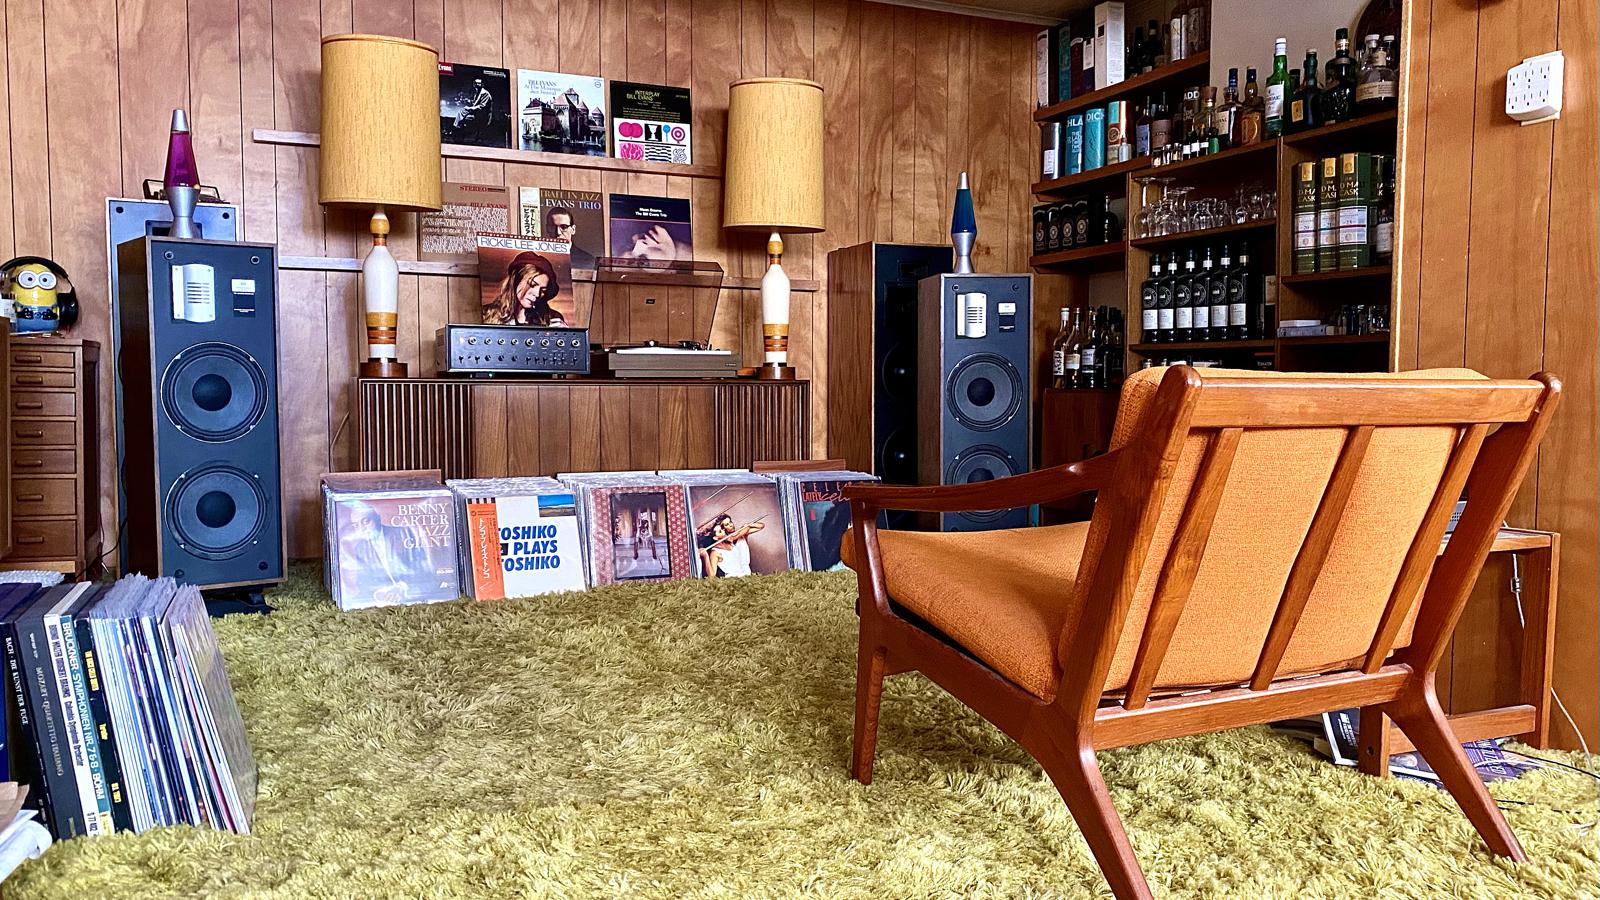 audioloveyyc hi-fi stereo system listening room